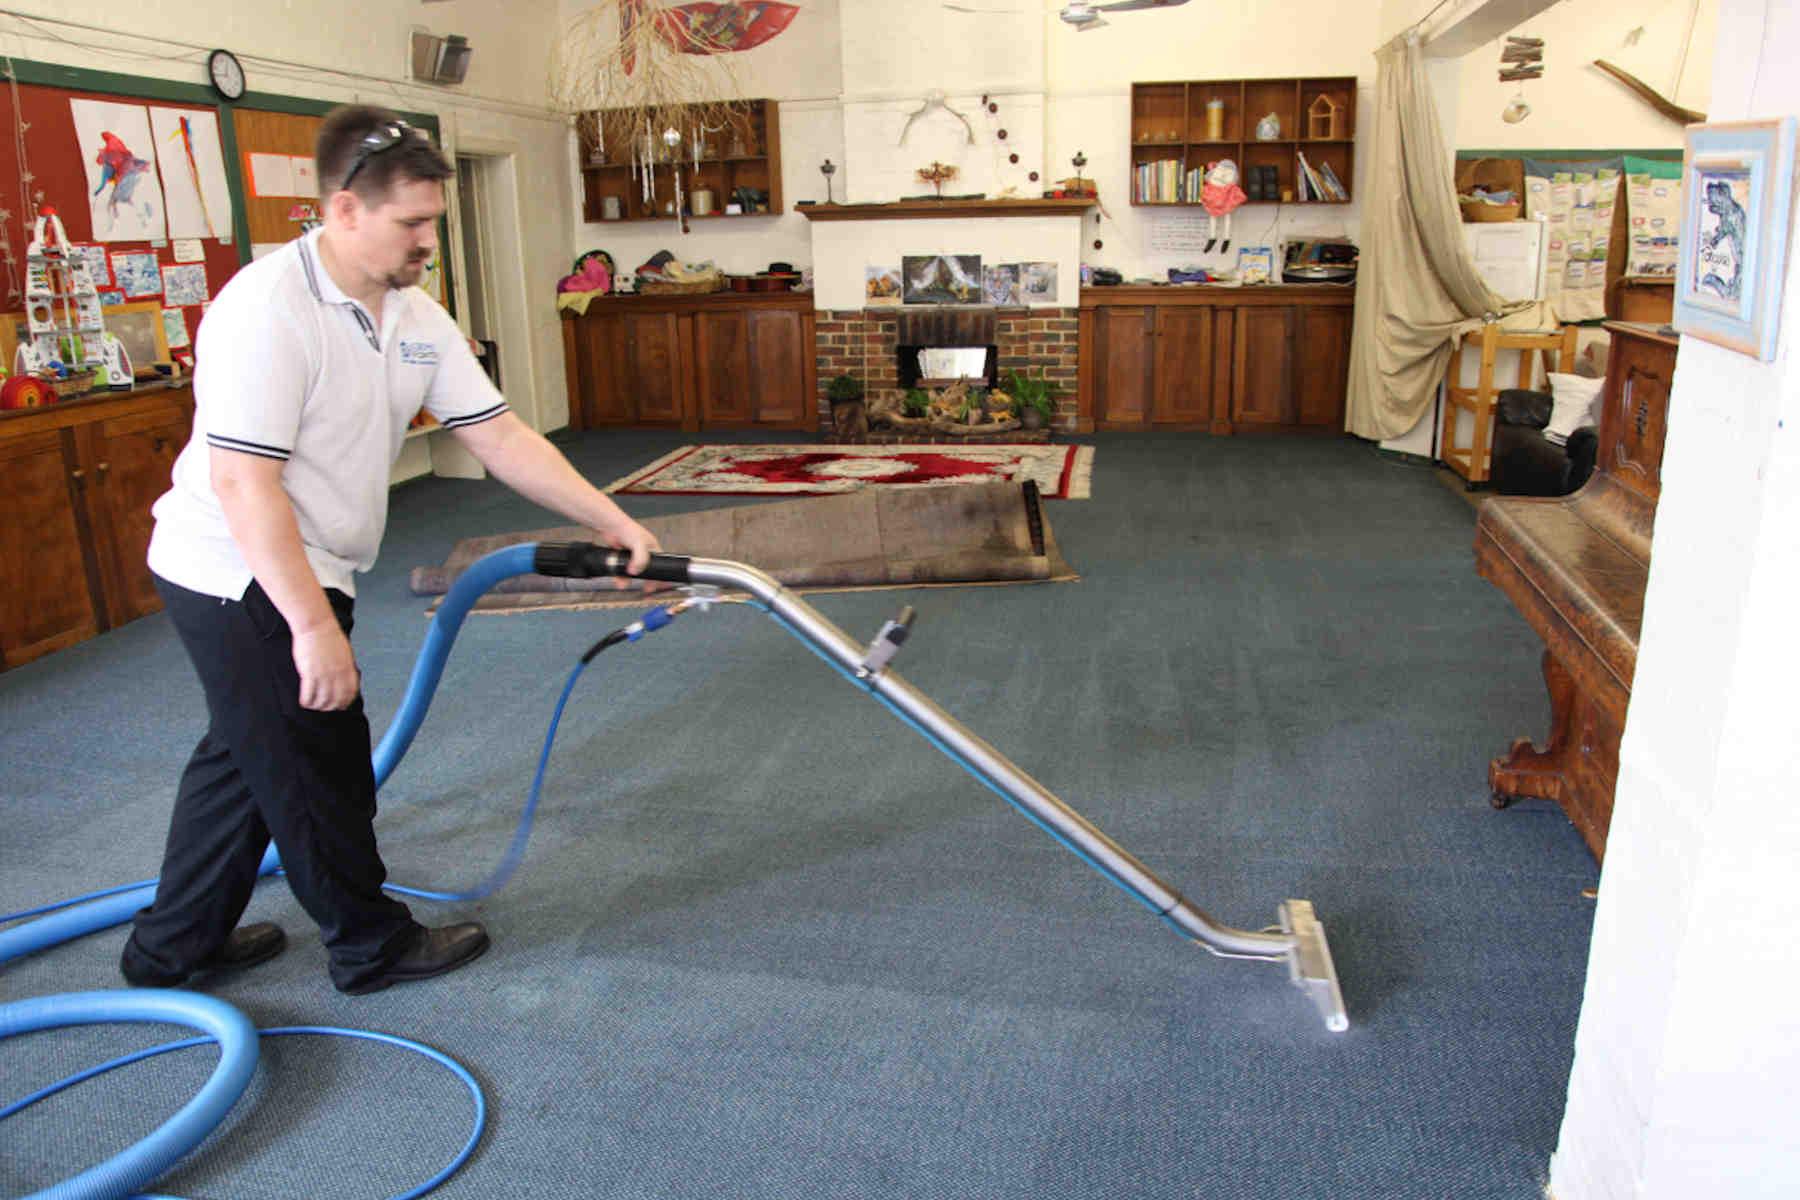 Carpet Cleaning Melbourne - Steam cleaning kindergarten carpets